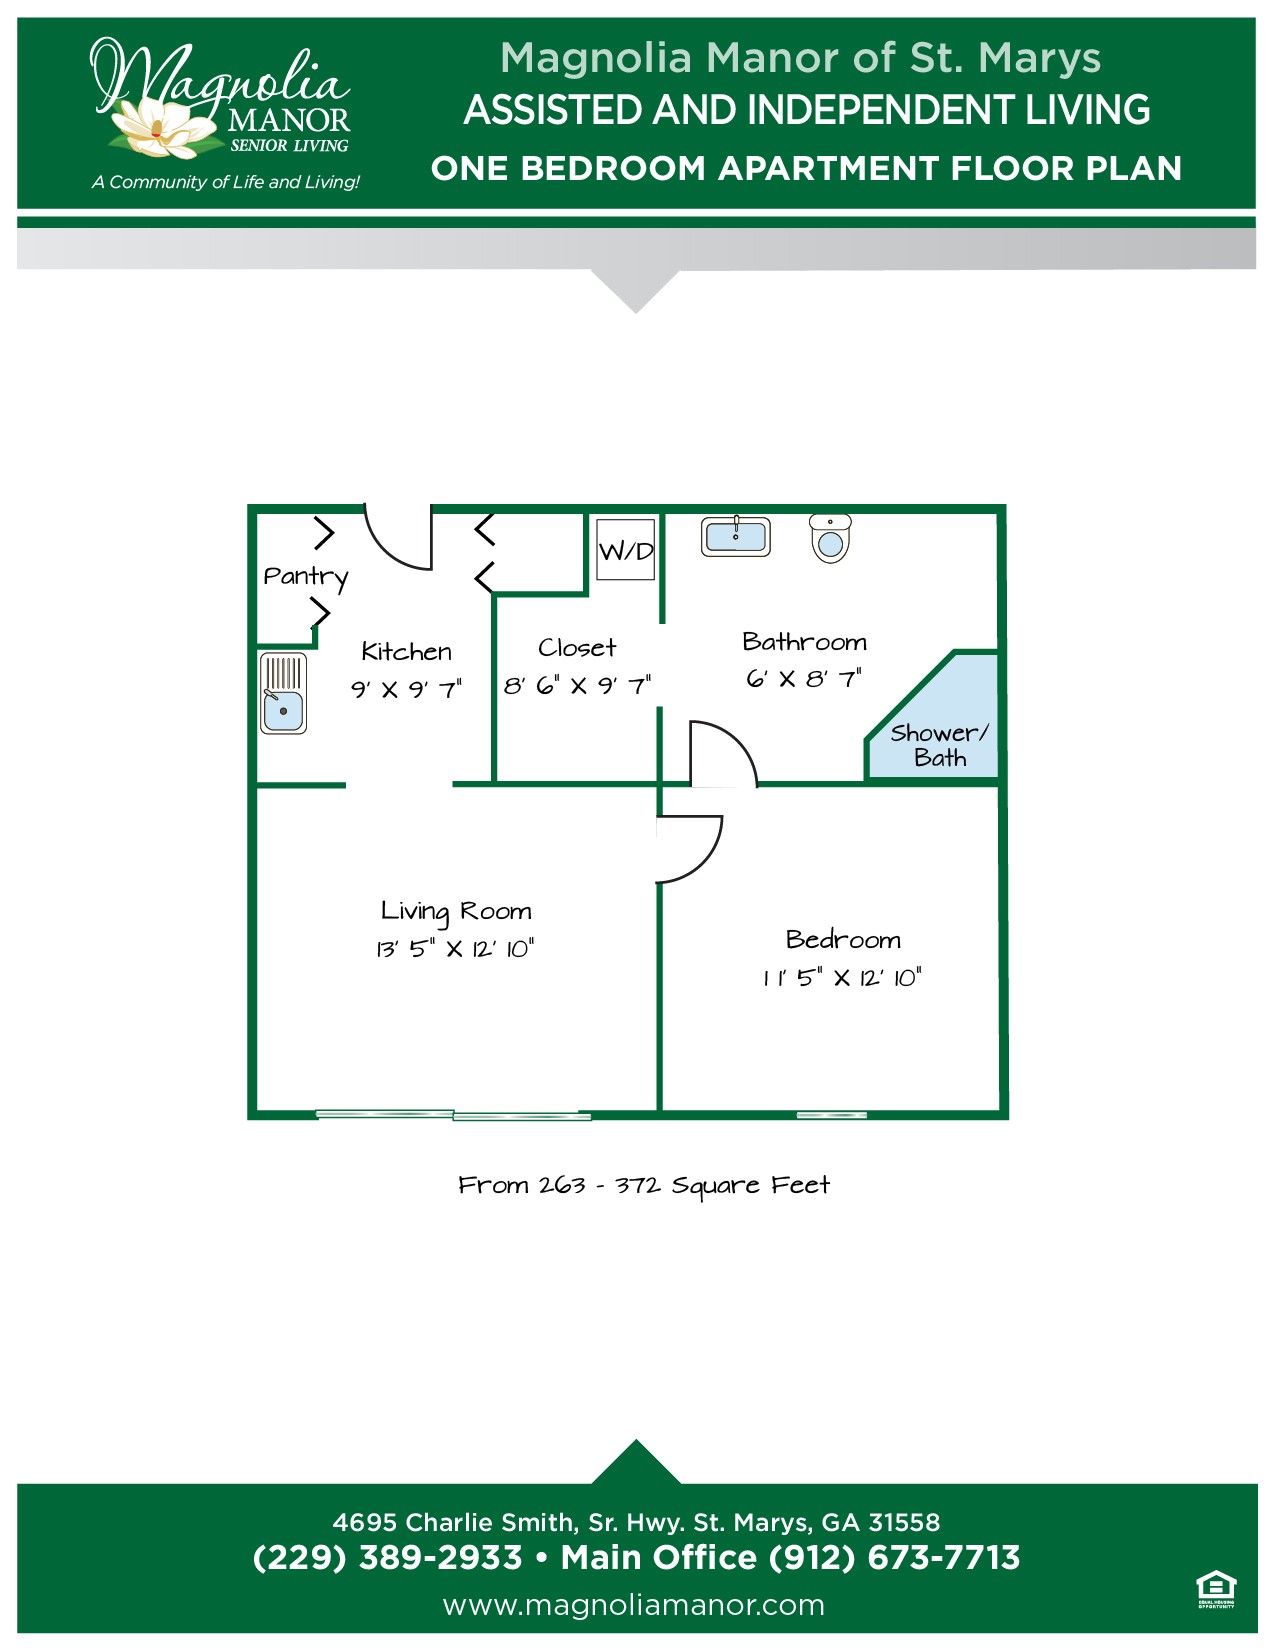 00344 St Marys One Bedroom Apartment Floor Plans AL & IL 2019-01